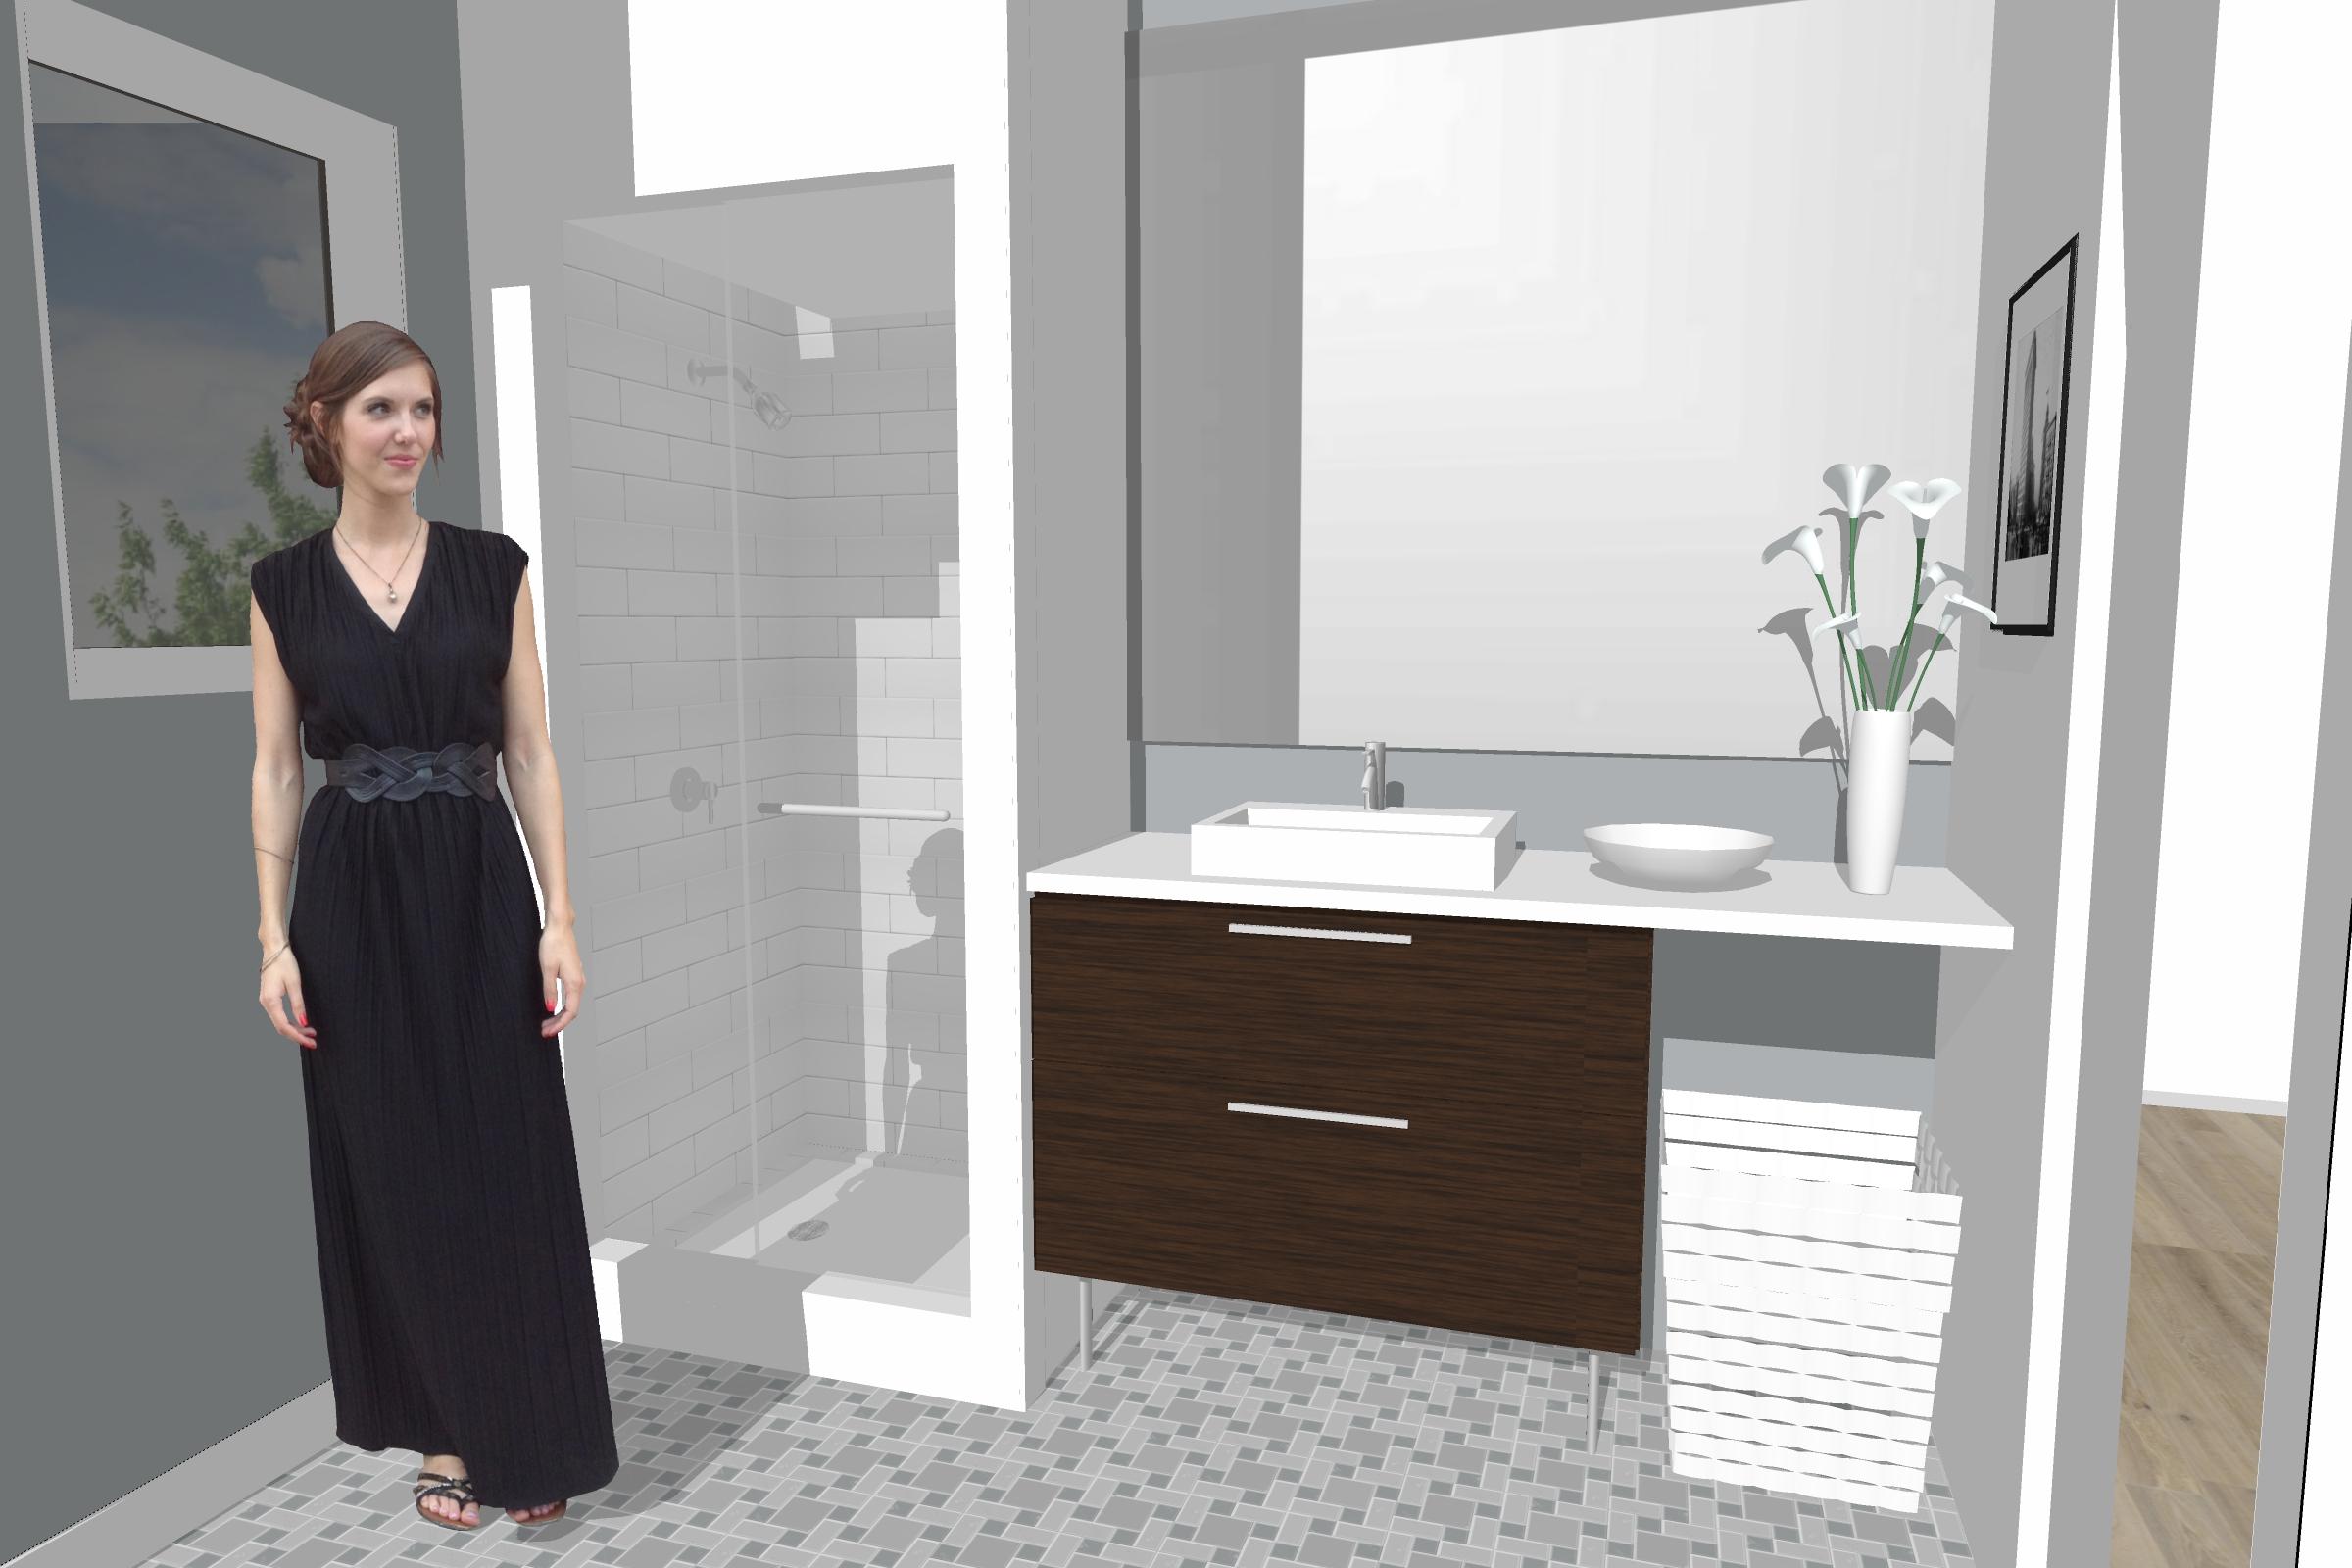 _small_INT - UNIT 4 BATHROOM OPT 1.jpg